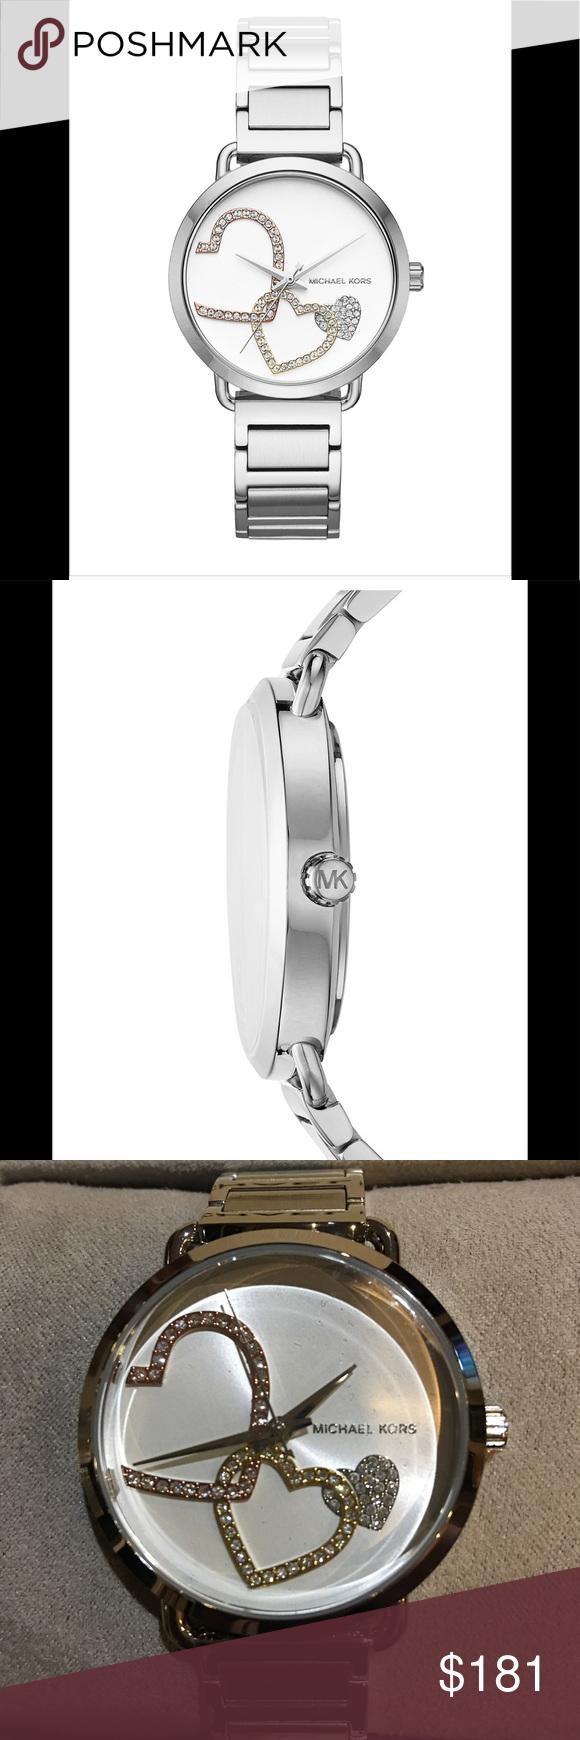 751cc92447ce Michael Kors MK3823 Portia Silver Tone Watch Michael Kors MK3824 Portia  Silver Tone Stainless Steel Watch